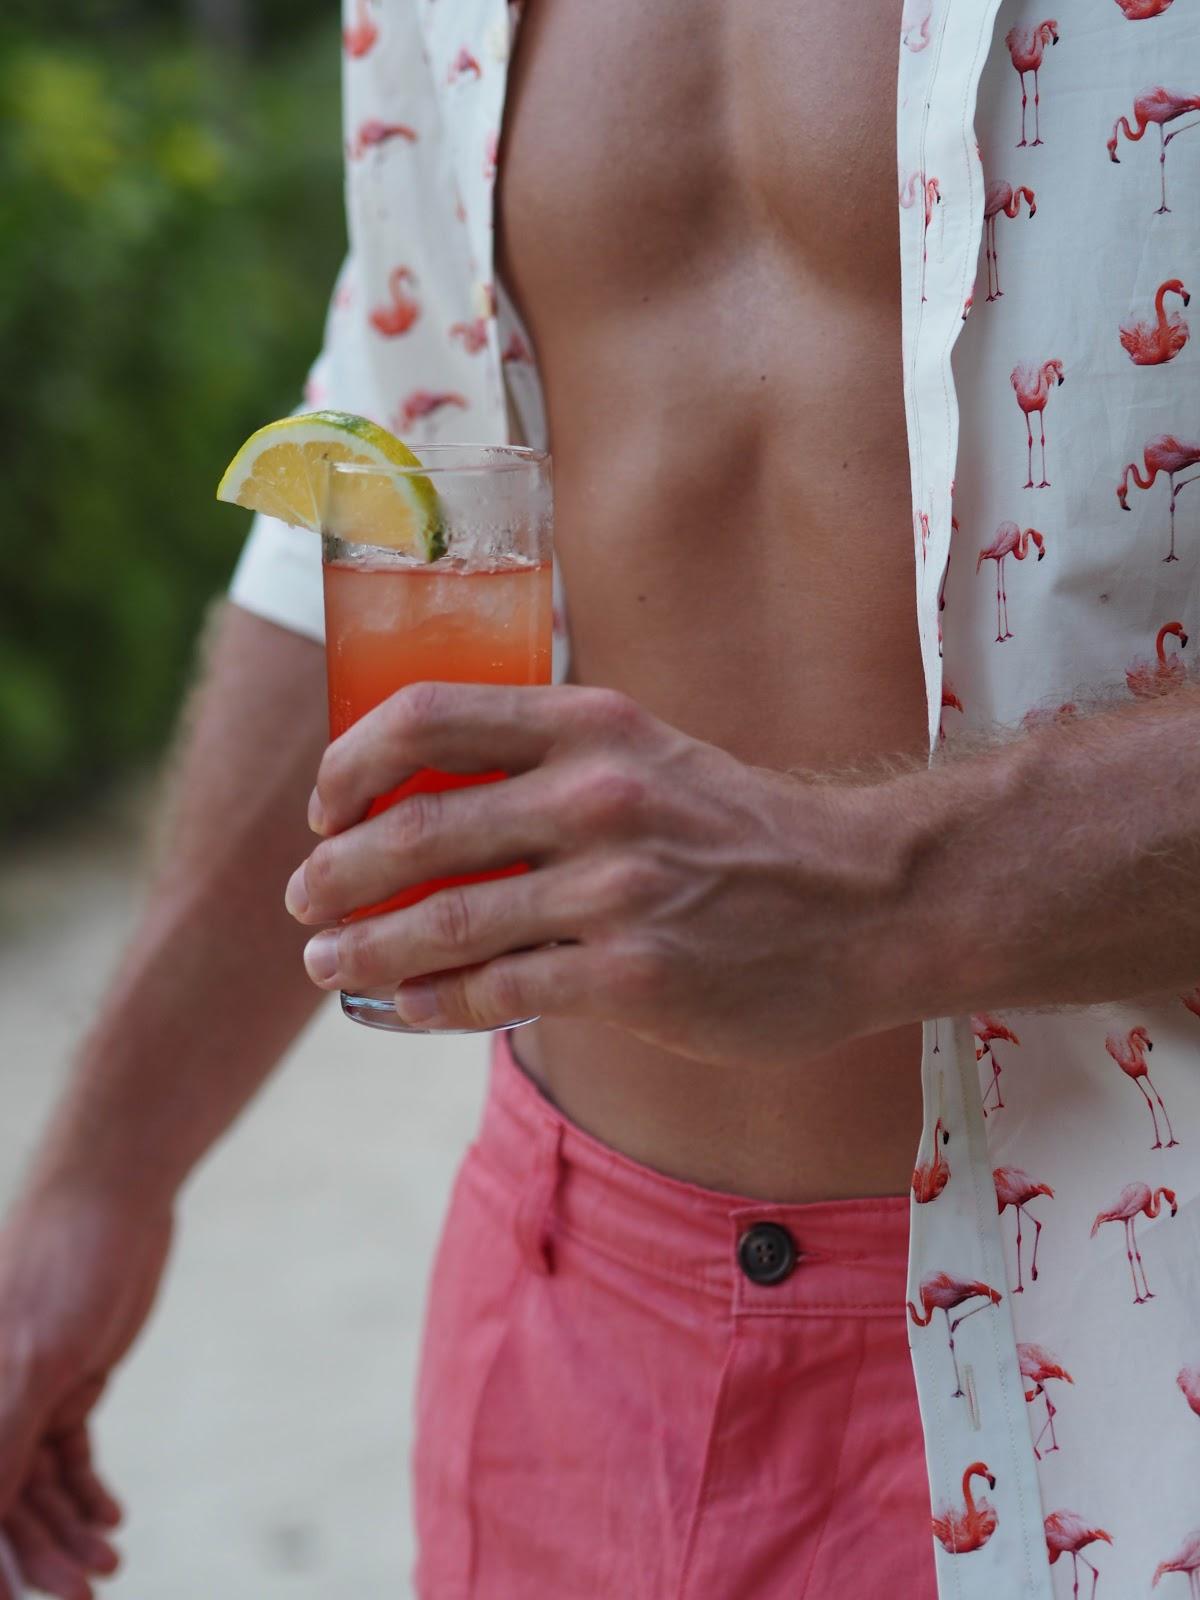 Simon Carter Shirt, Abs and Cocktail